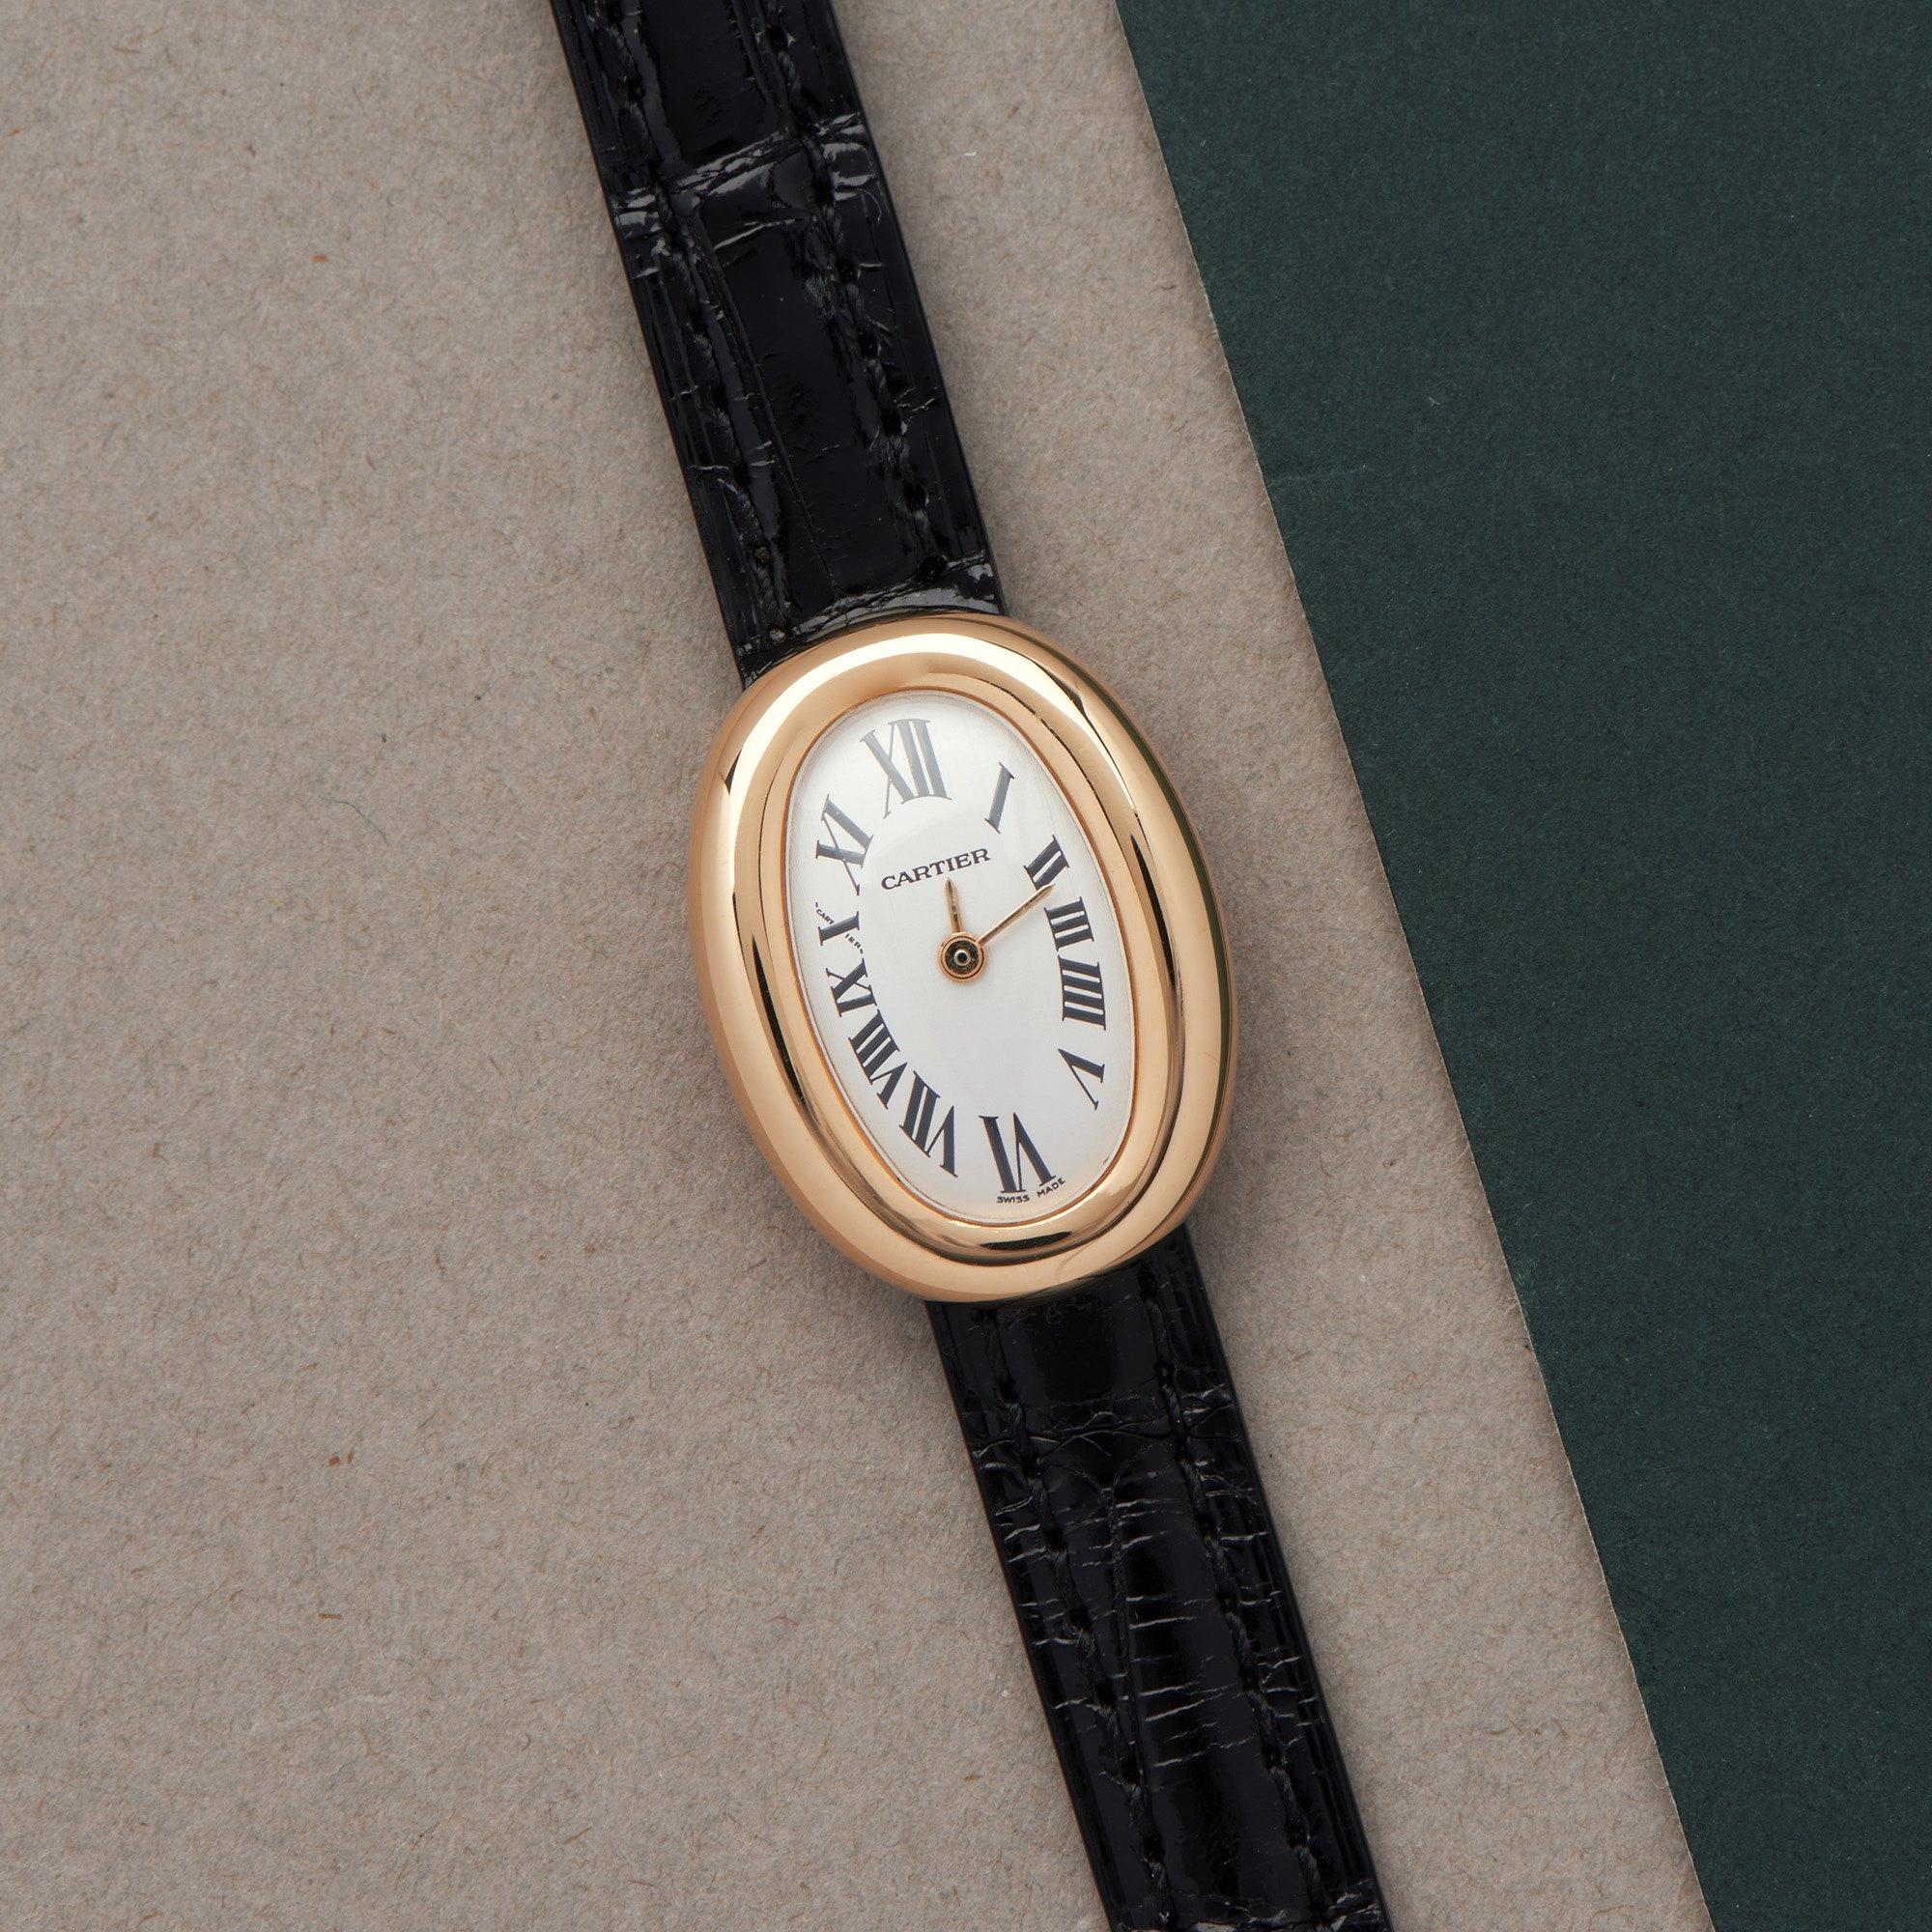 Cartier Baignoire 18K Yellow Gold W1536699 or 2368